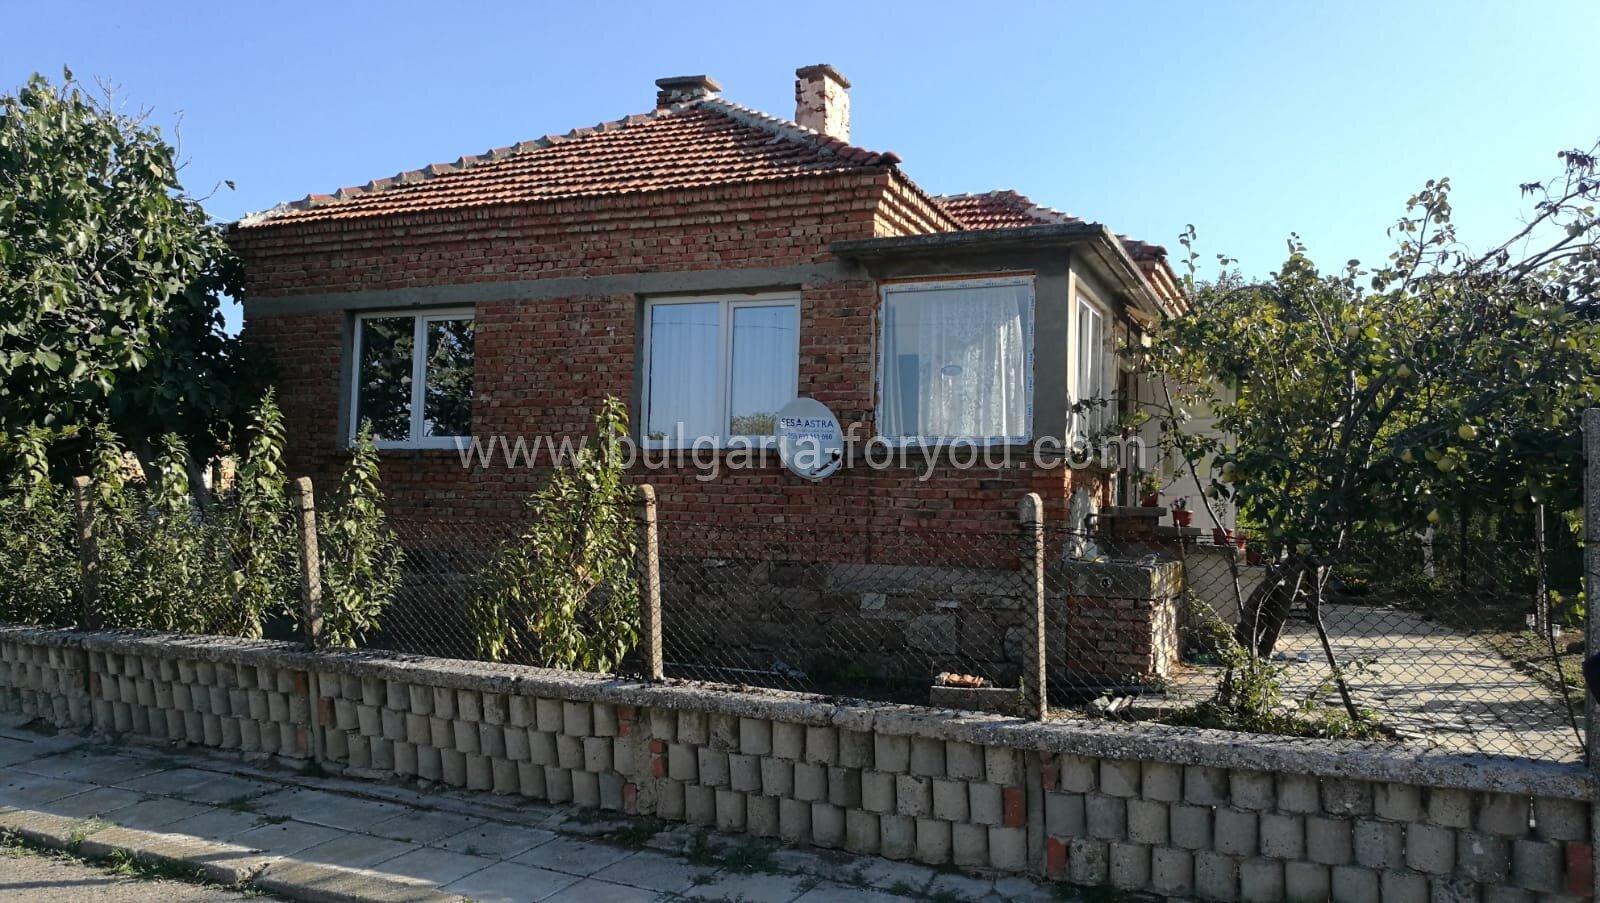 Недорогие дома на побережье болгарии рейс u6 3091 москва дубай